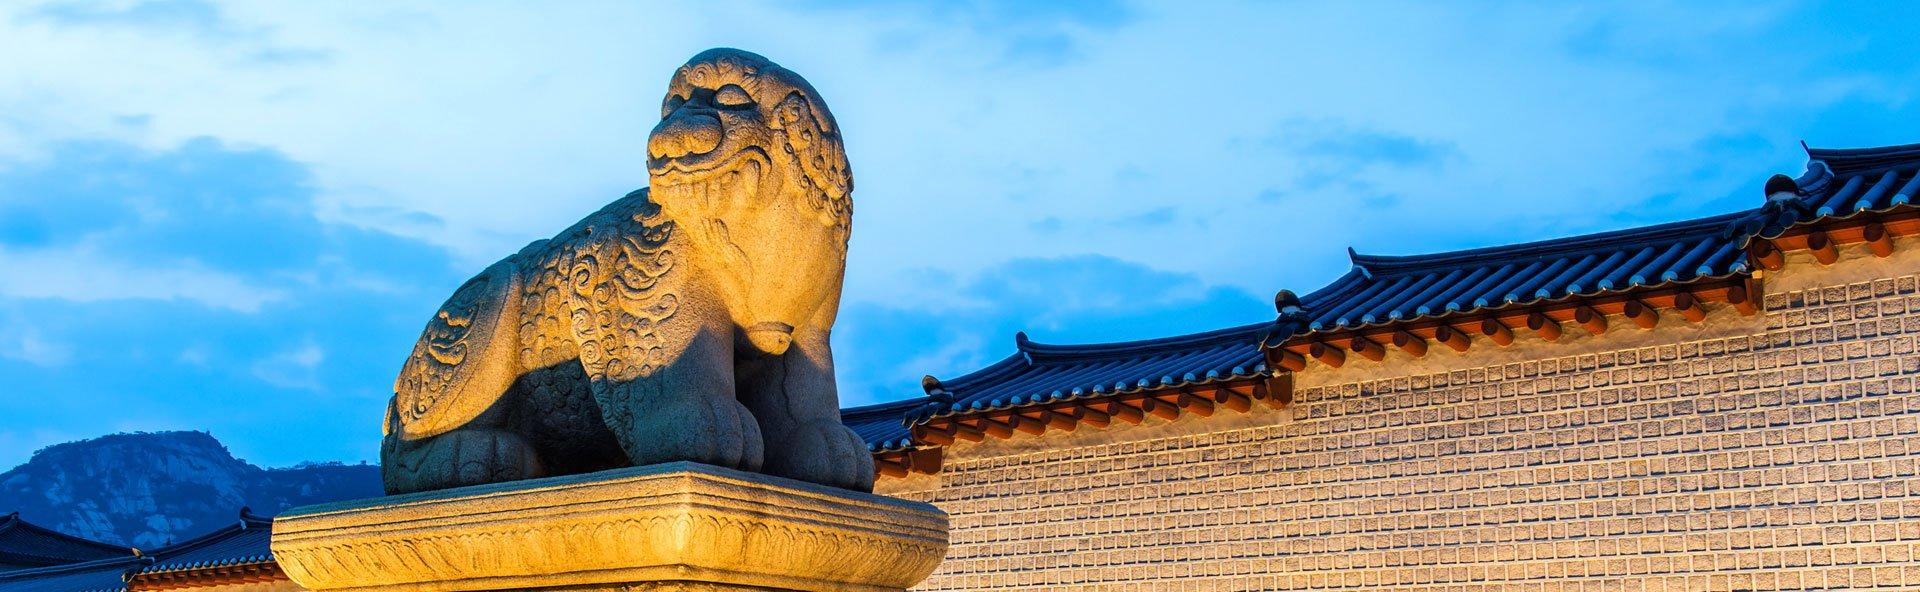 Gyeongbokgung Palace Traditional Statue of Lion